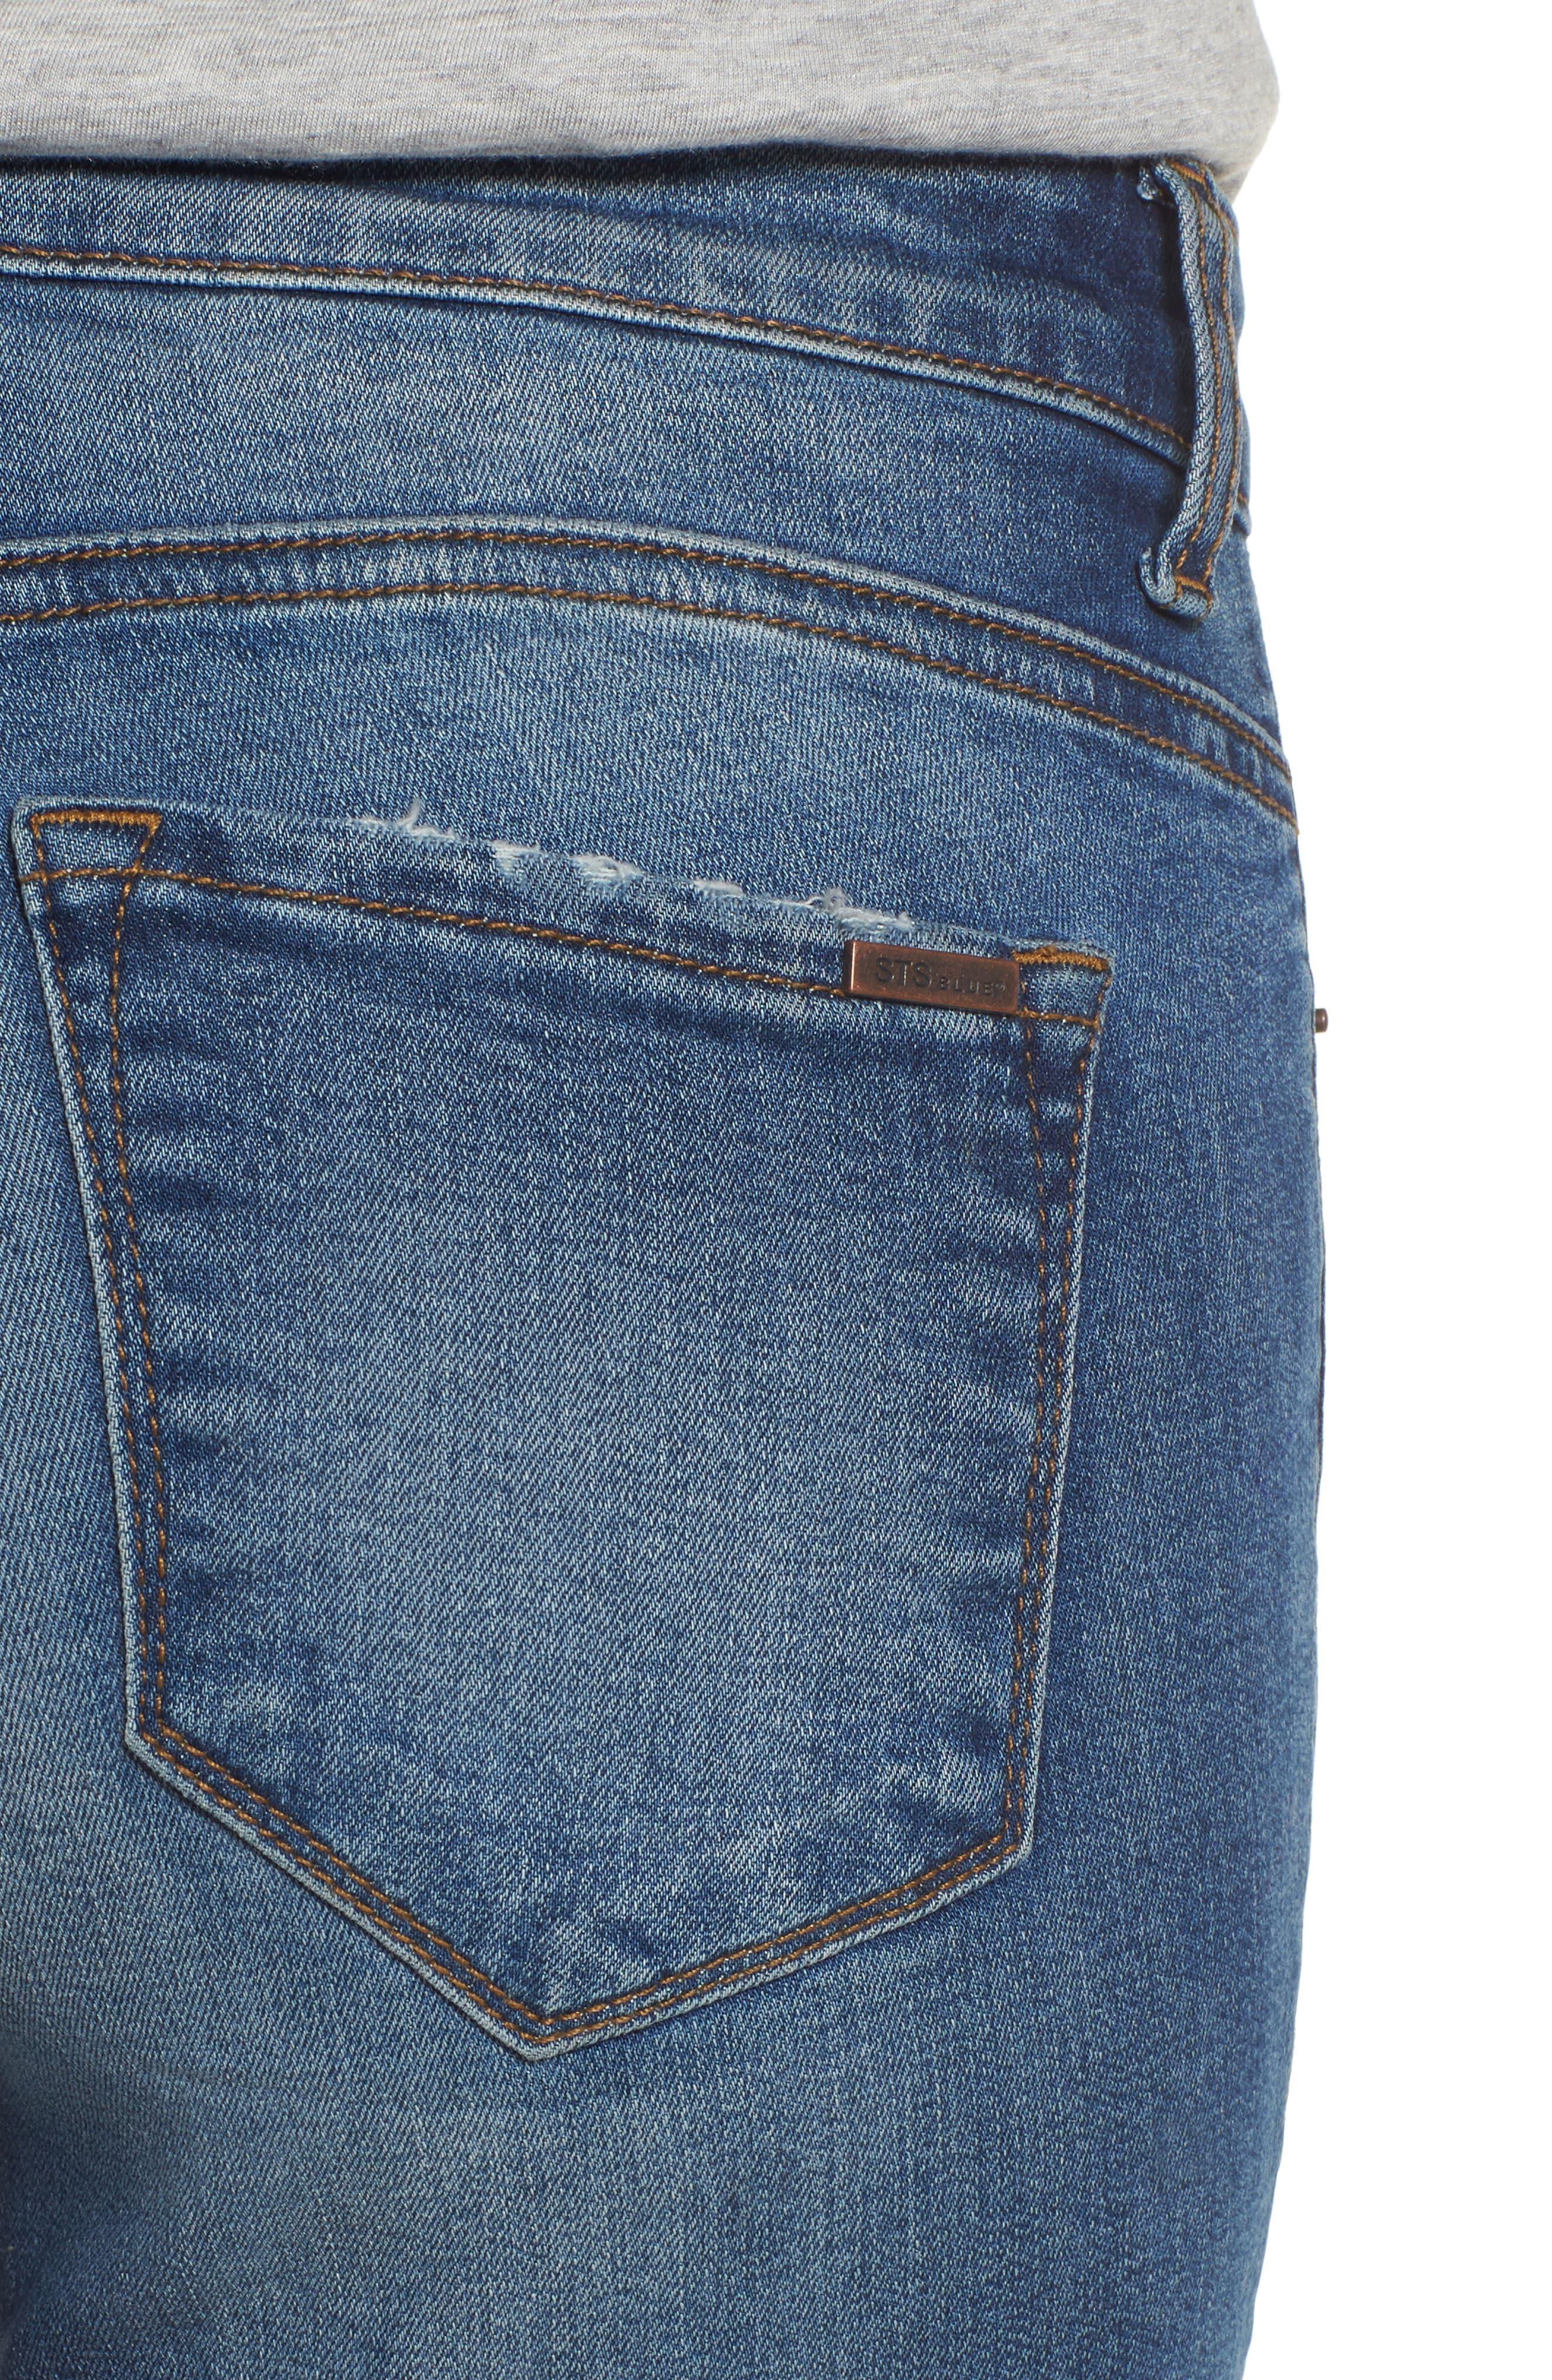 Cuffed Bermuda Denim Shorts,                             Alternate thumbnail 4, color,                             406